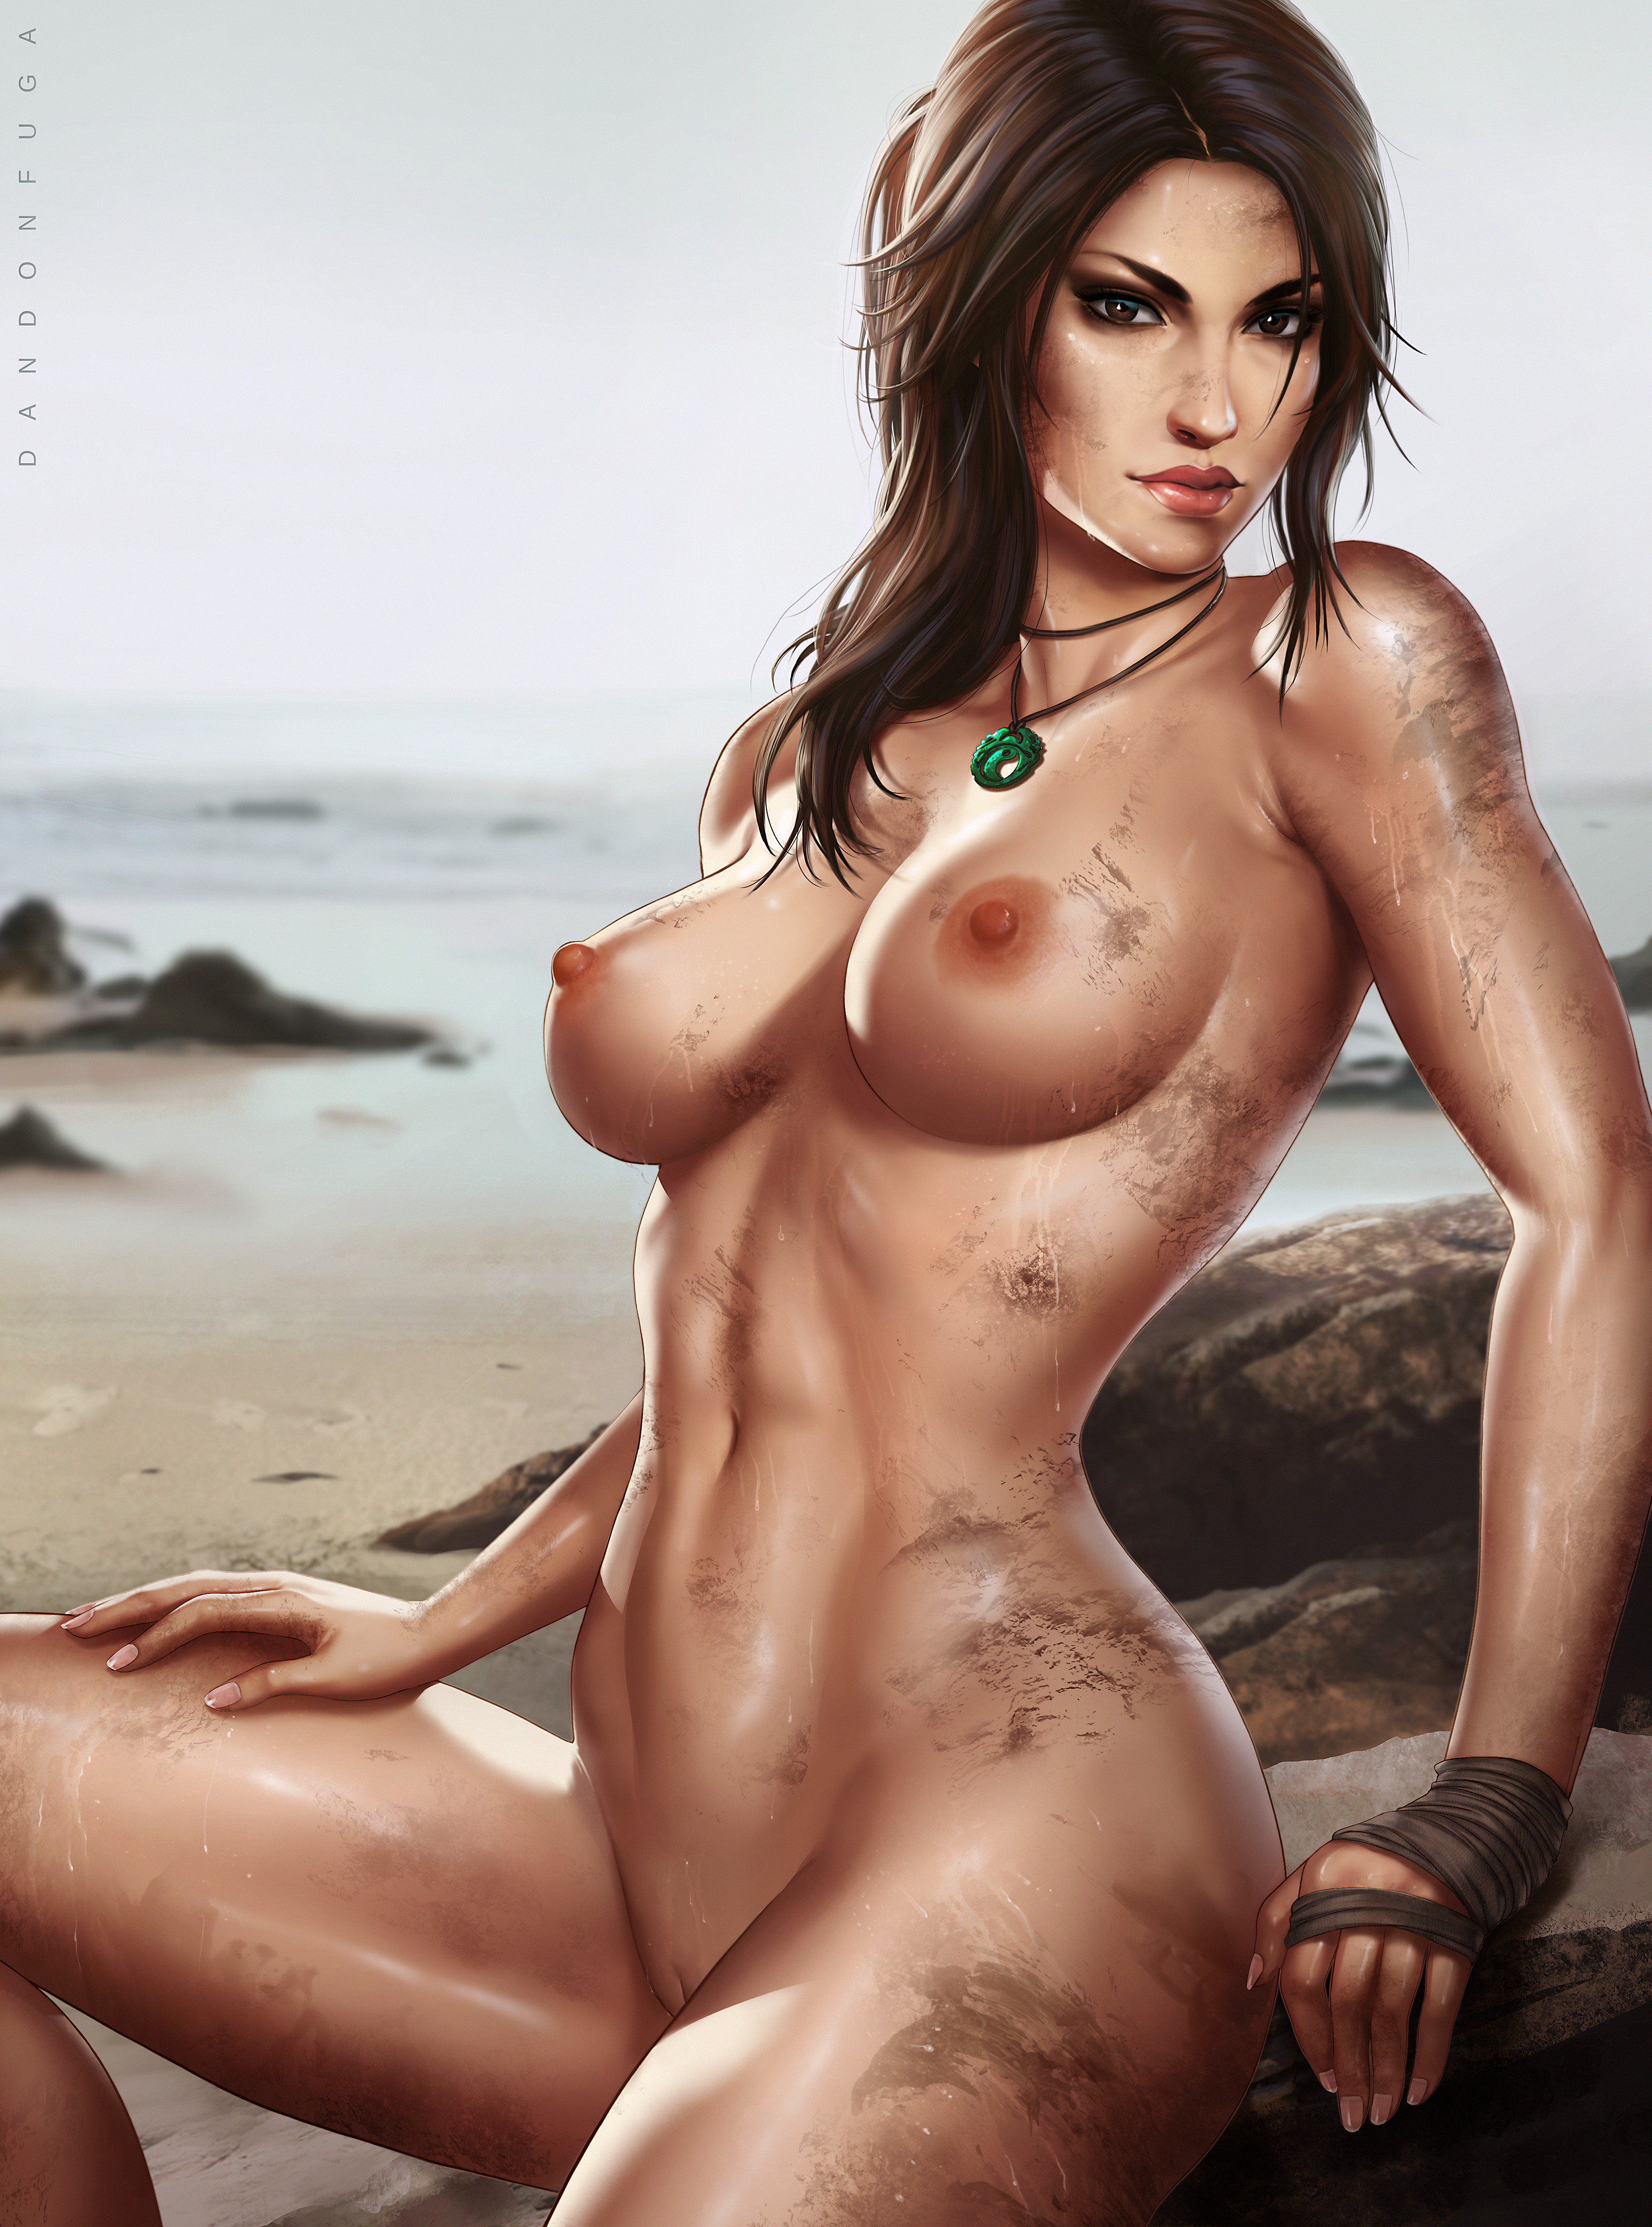 Karen lancaume lara croft nude raider 03 - 3 3